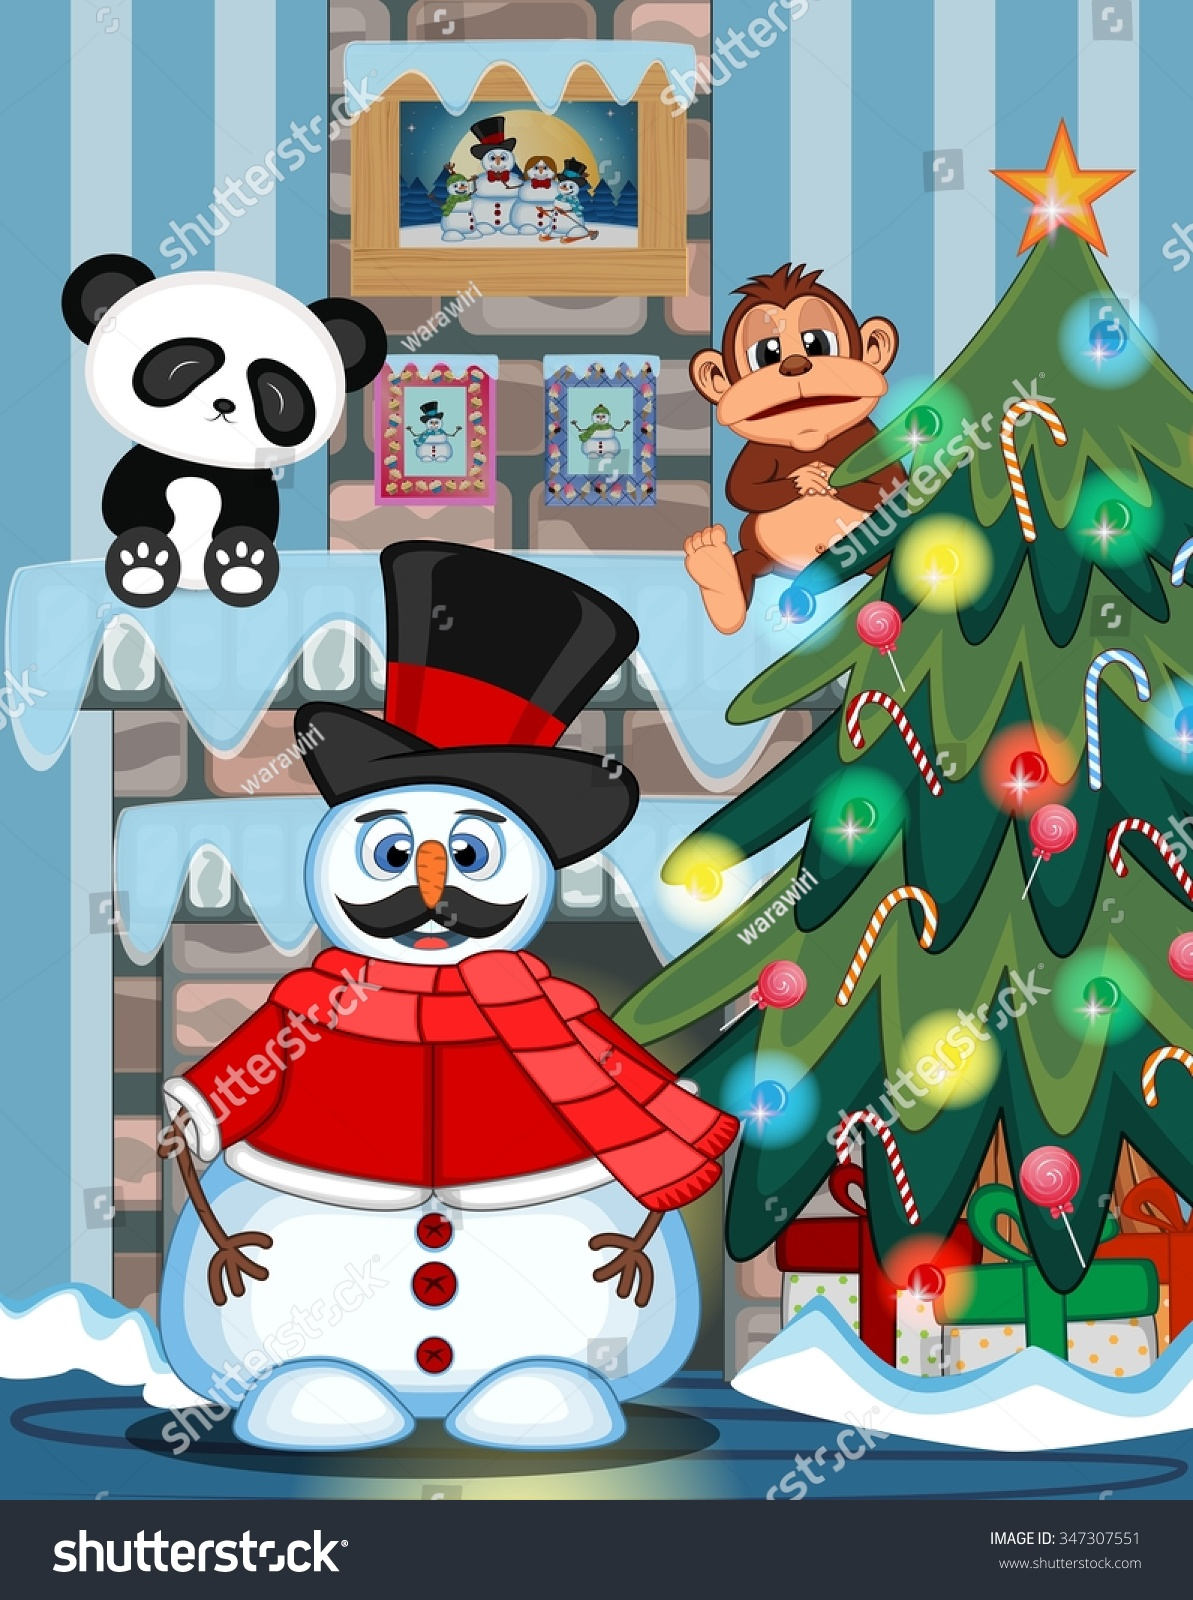 Snowman Mustache Wearing Hat Red Sweater Stock Illustration ...